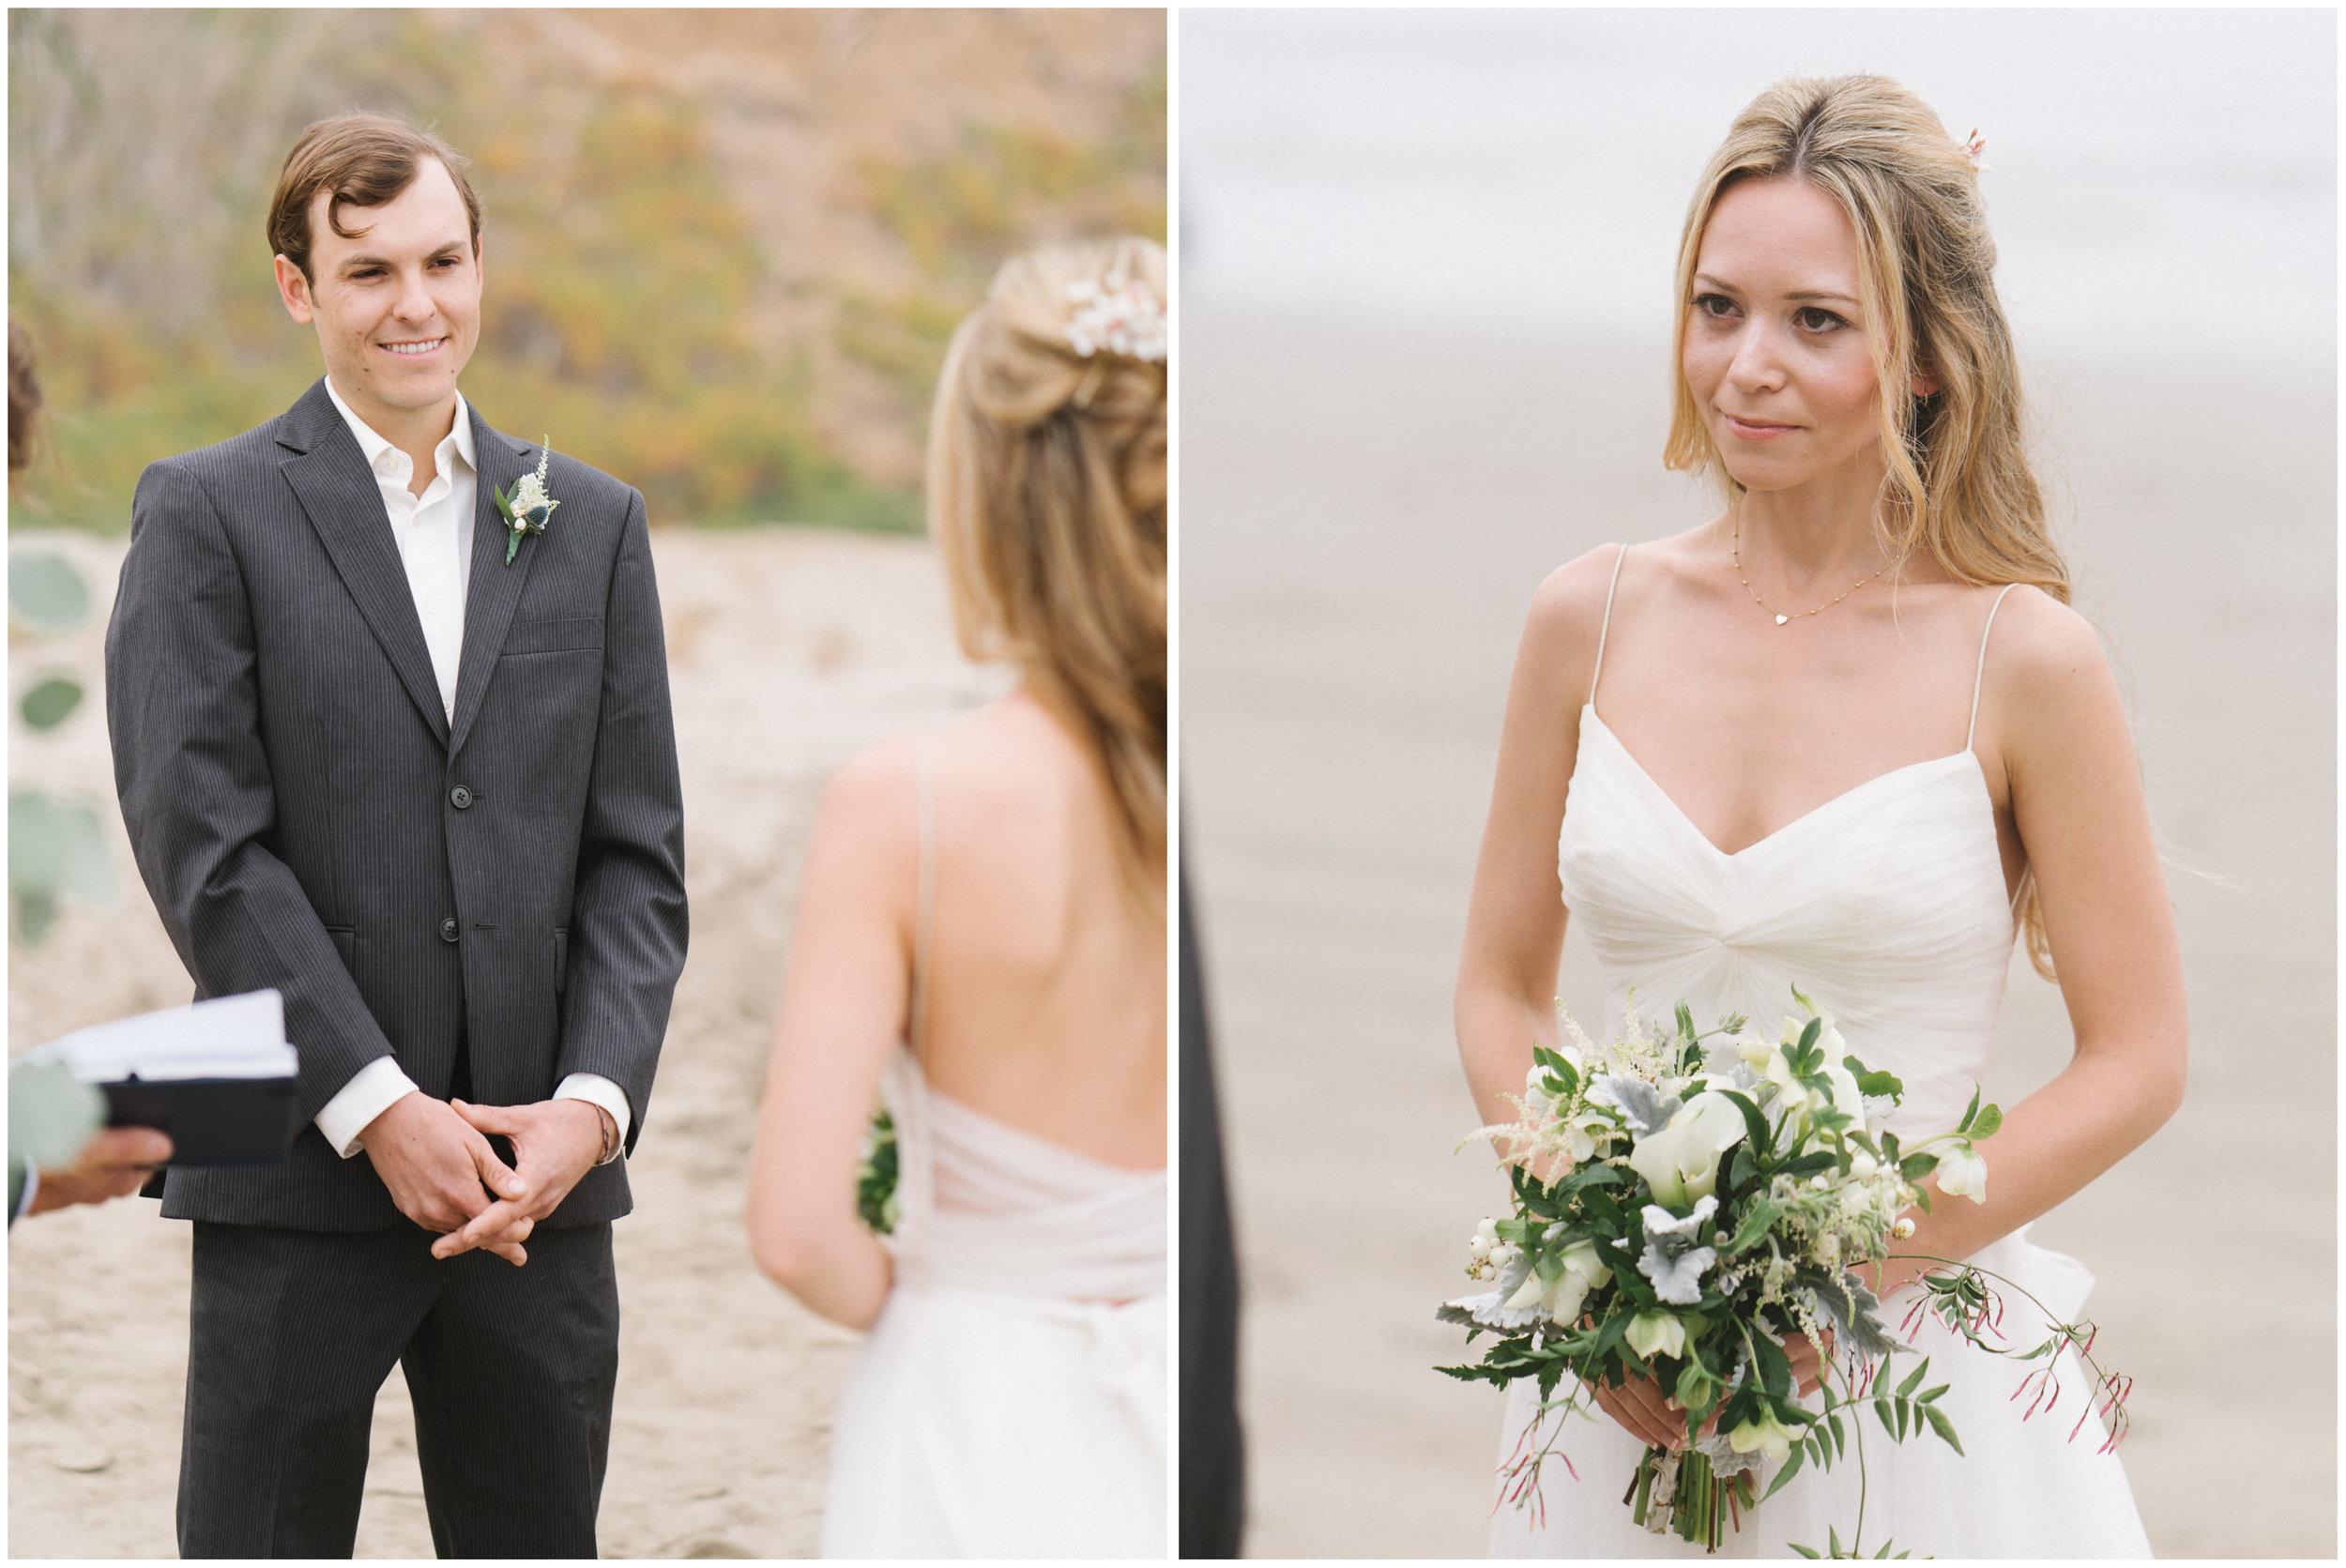 Santa Barbara Elopement Wedding Photographer - Pinnel Photography-06.jpg